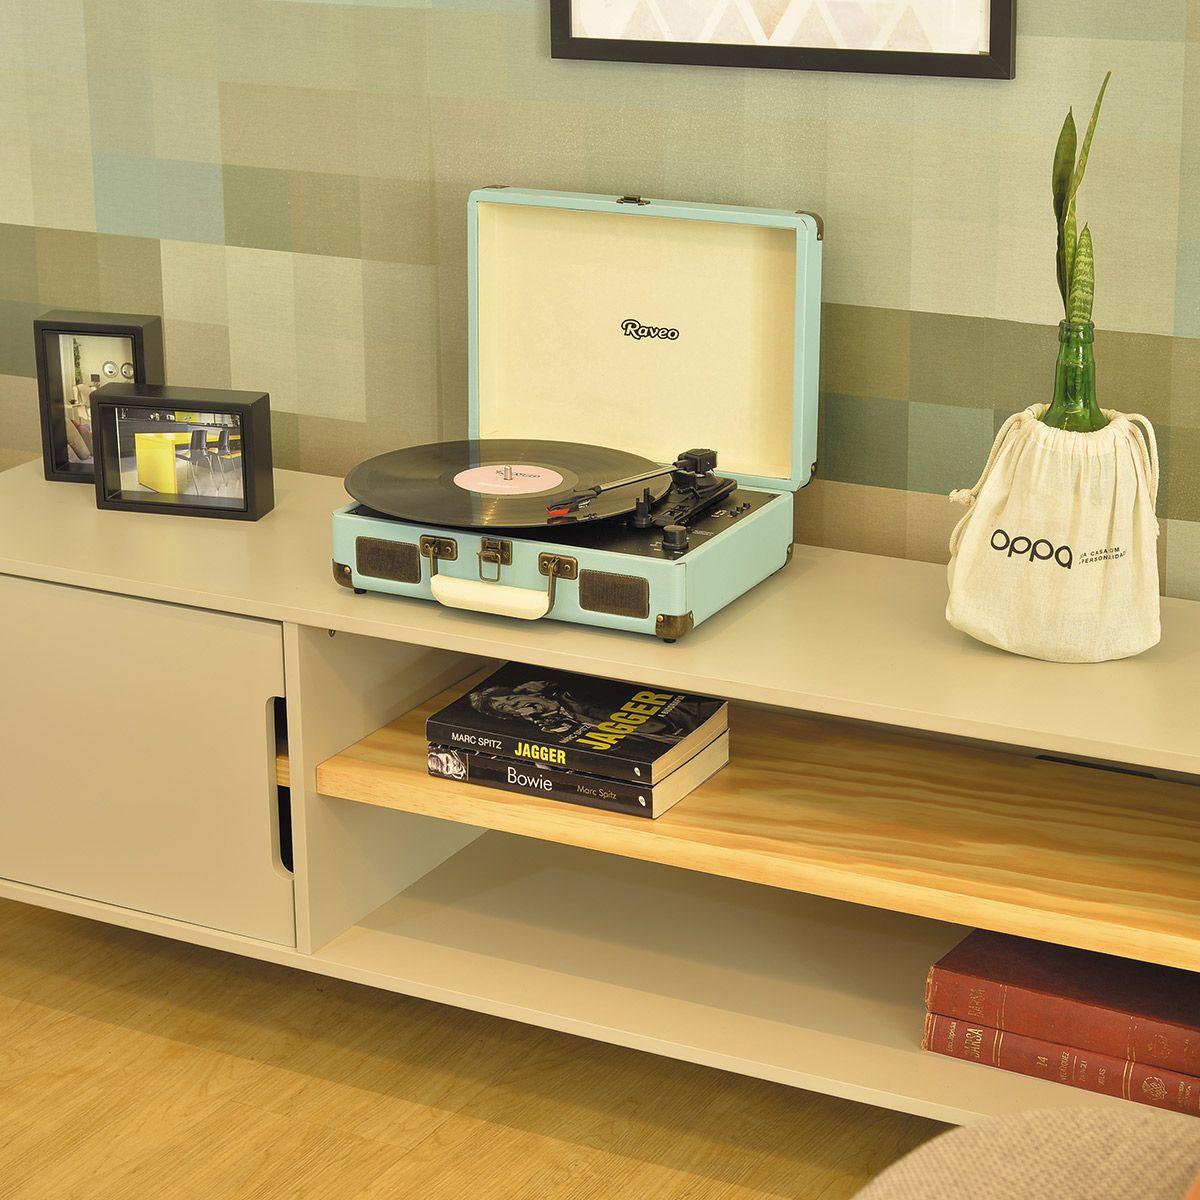 Vitrola Raveo Sonetto Light Blue c/ Toca Disco, bluetooth, USB Rec, Selo Anatel